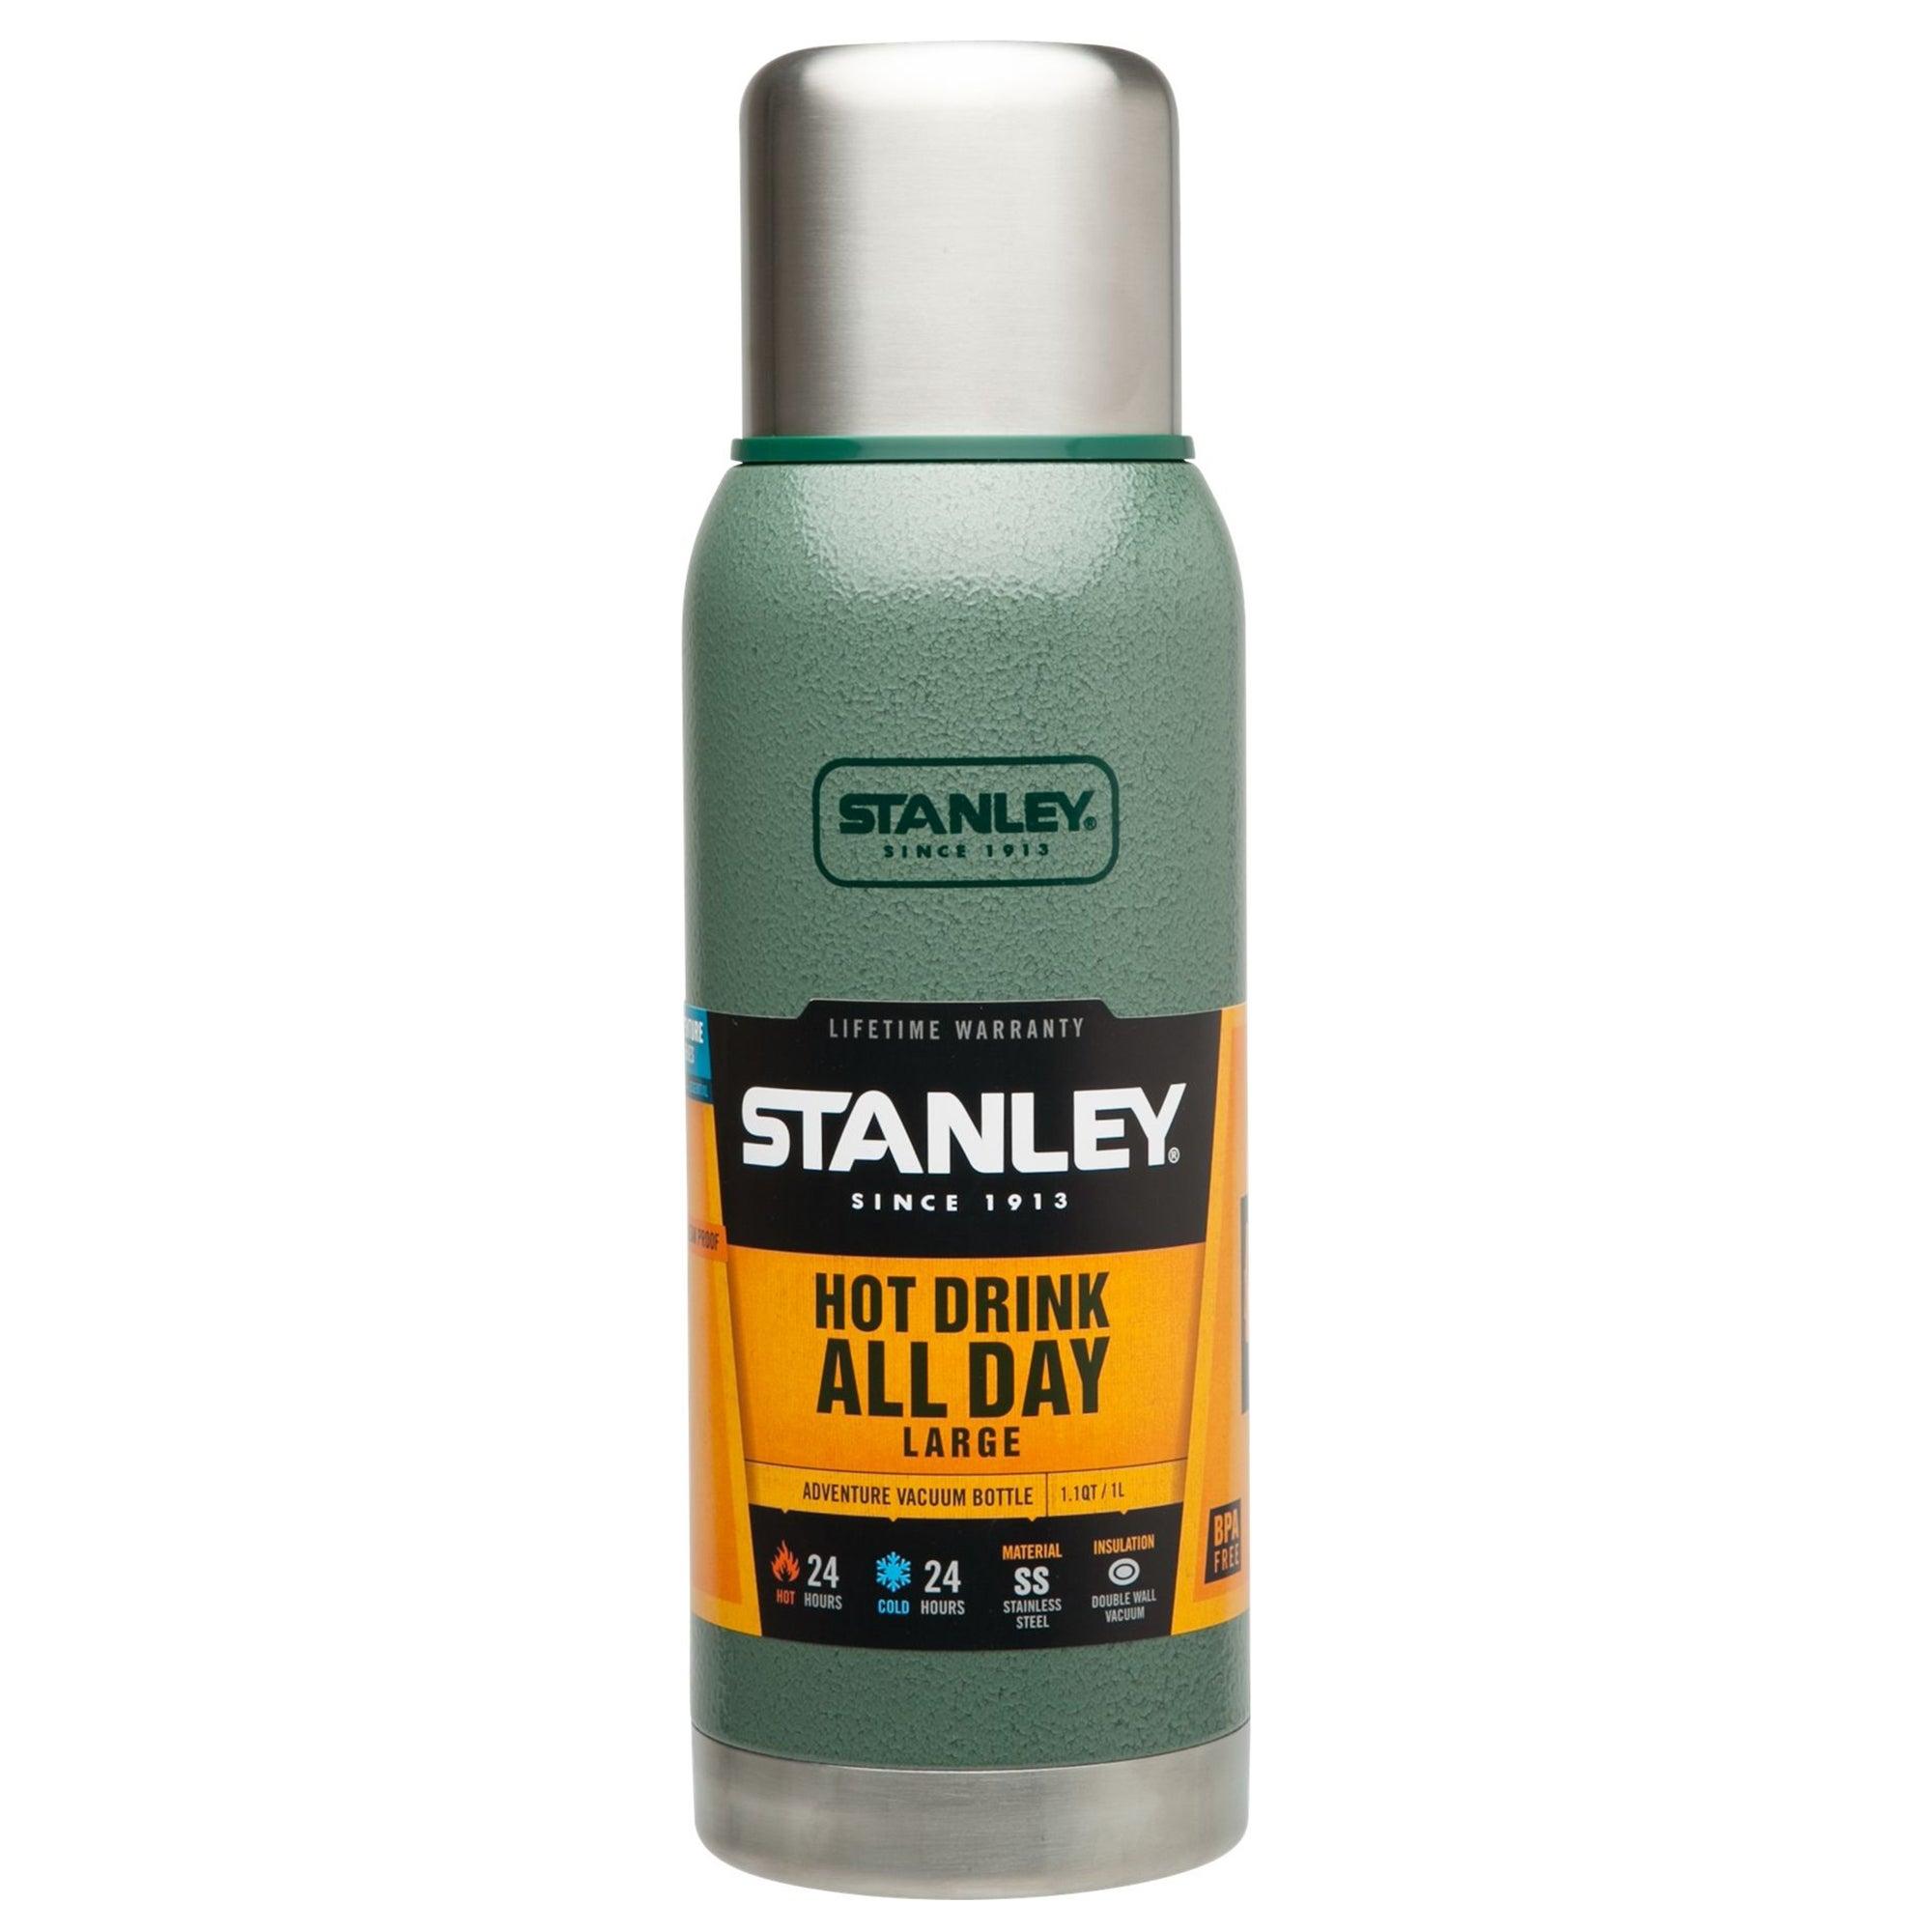 Stanley Adventure 1 Litre Vacuum Flask